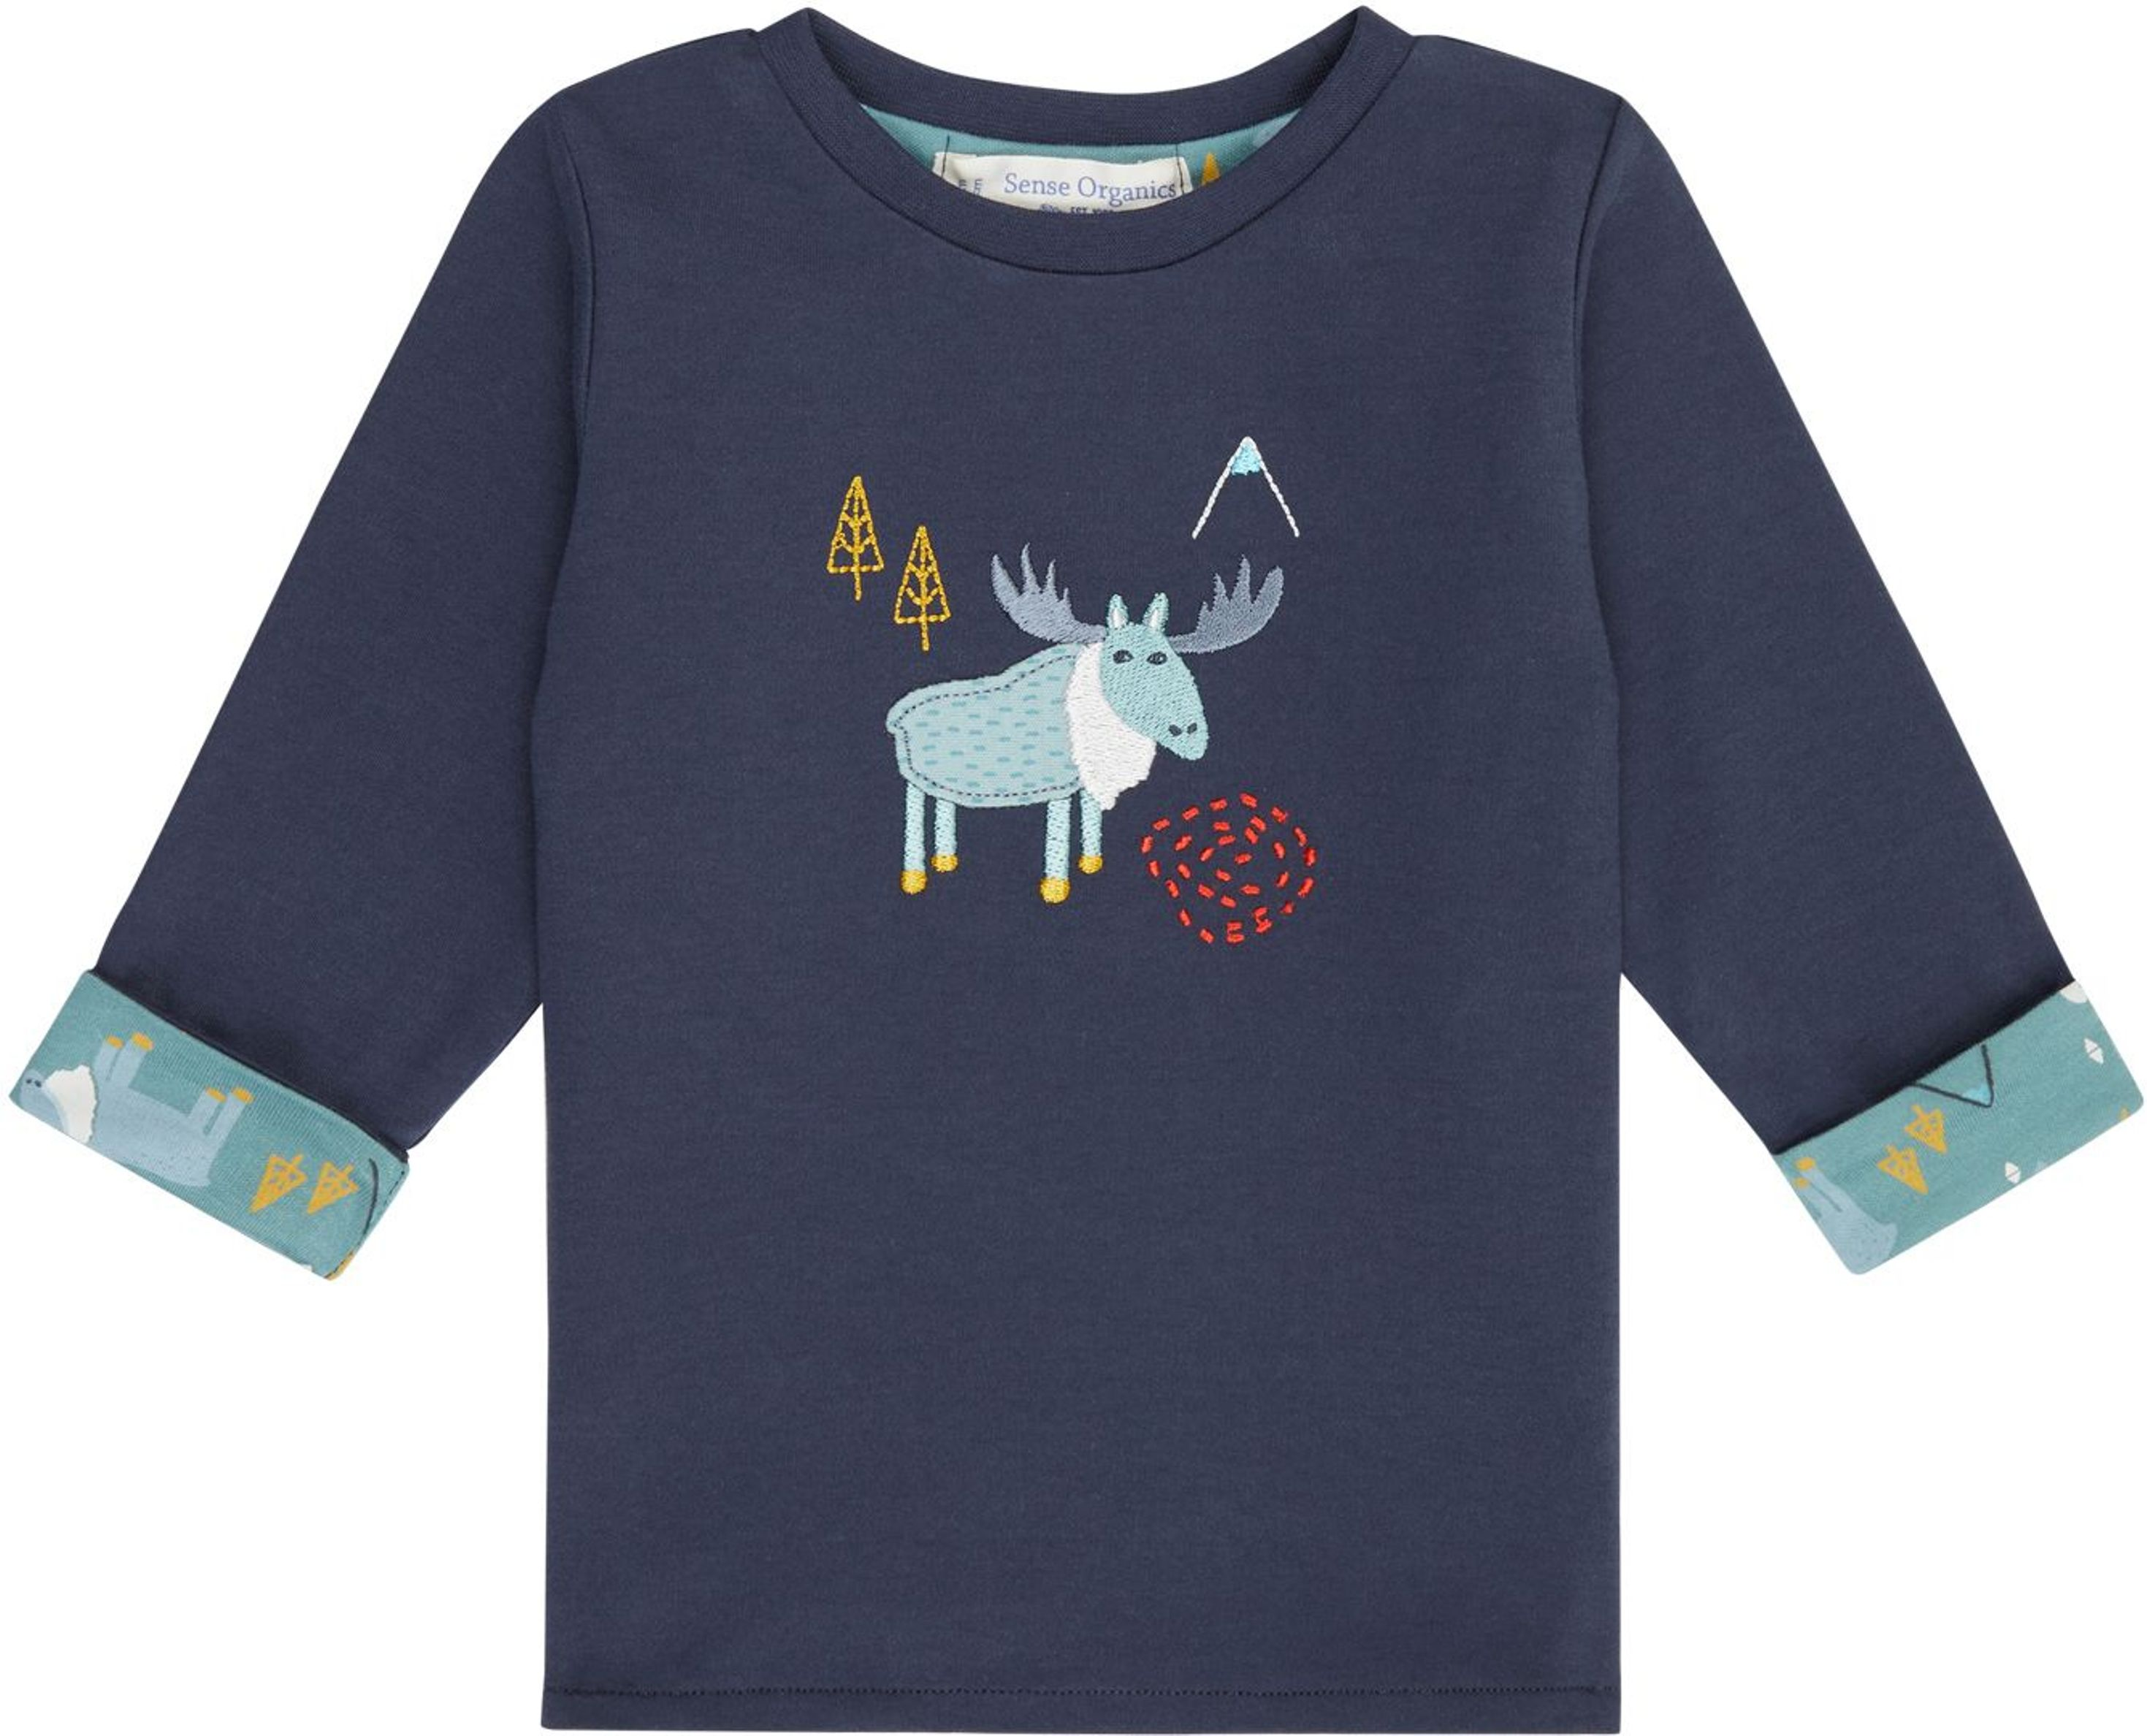 Sense Organic FELIX Baby Reversible Shirt L/S navy/reindeer